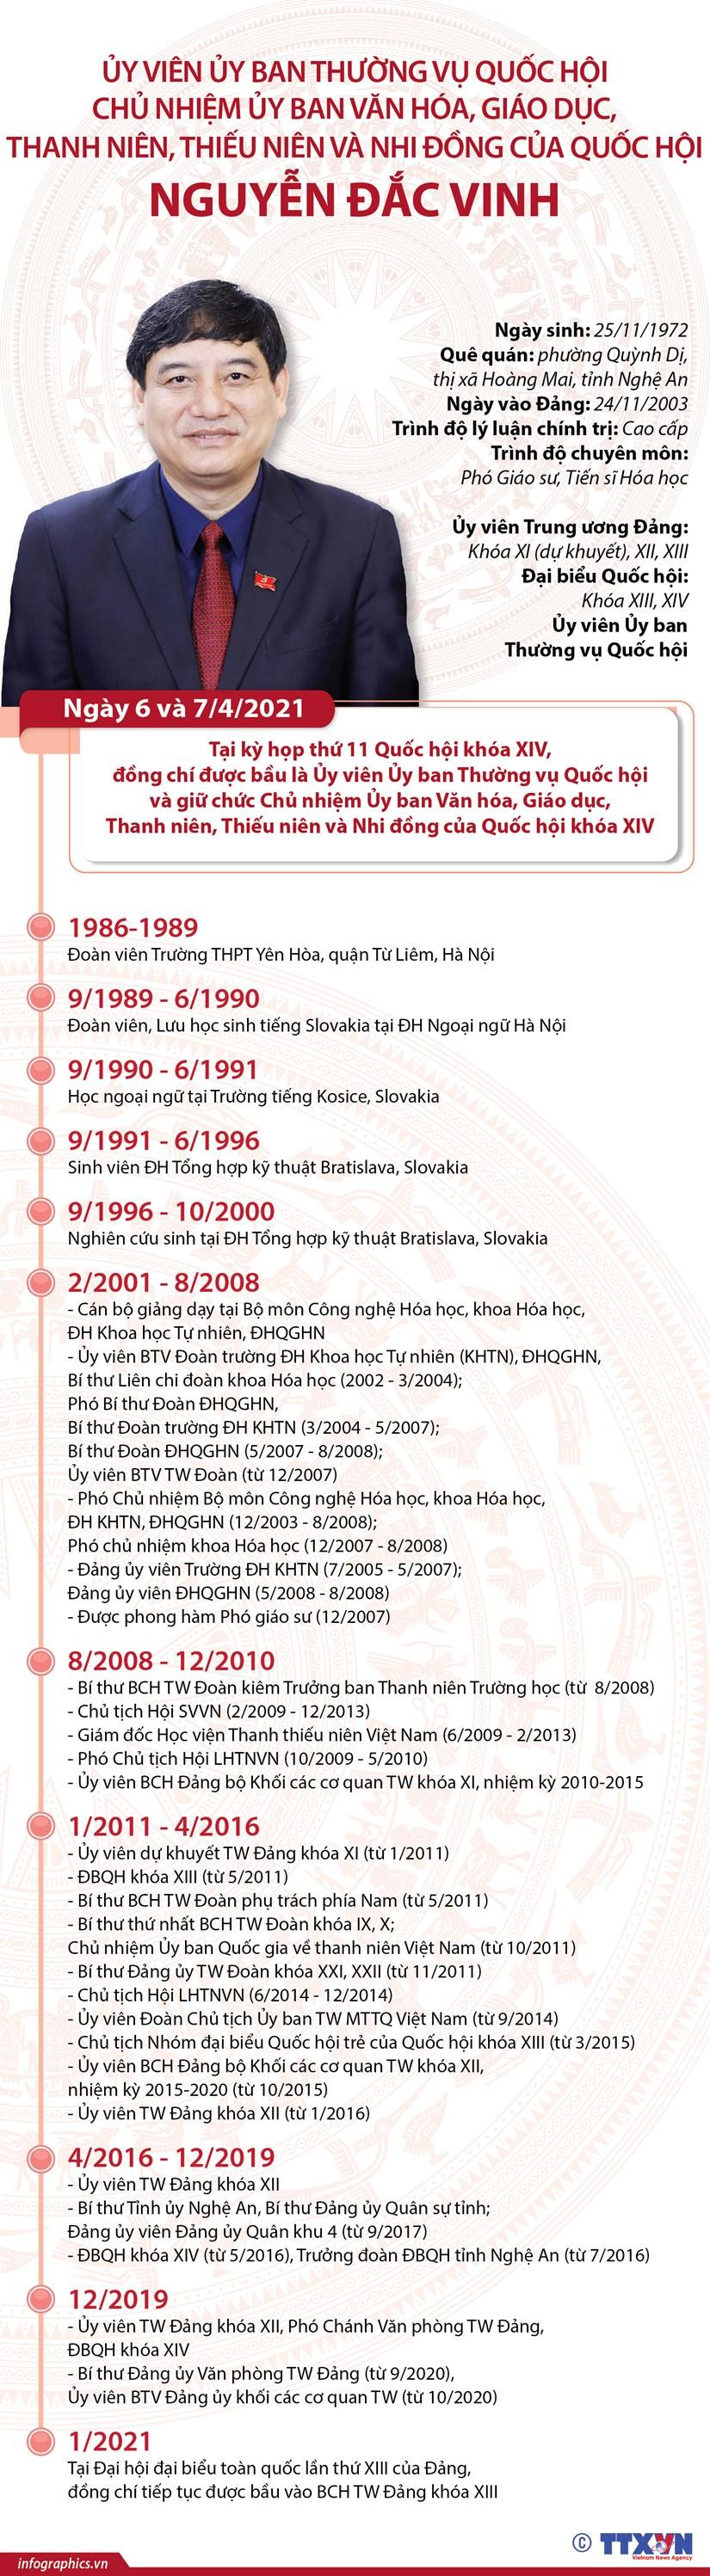 [Infographics] Ong Nguyen Dac Vinh duoc bau la Uy vien UBTVQH hinh anh 1